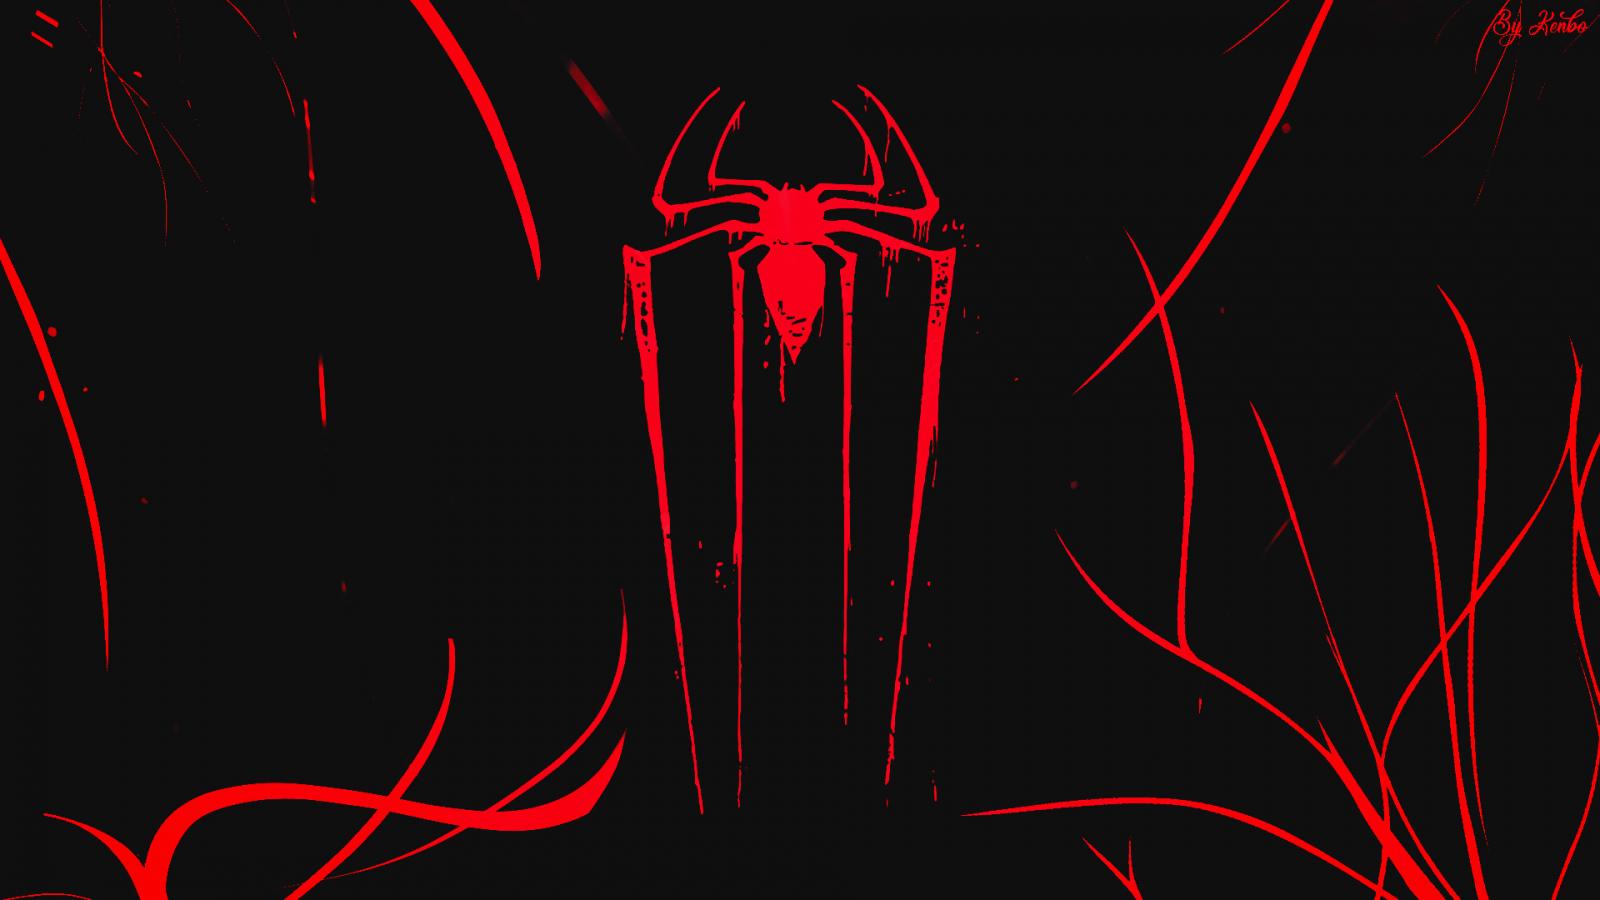 Logo, minimal, spider-man, dark, 1600x900 wallpaper